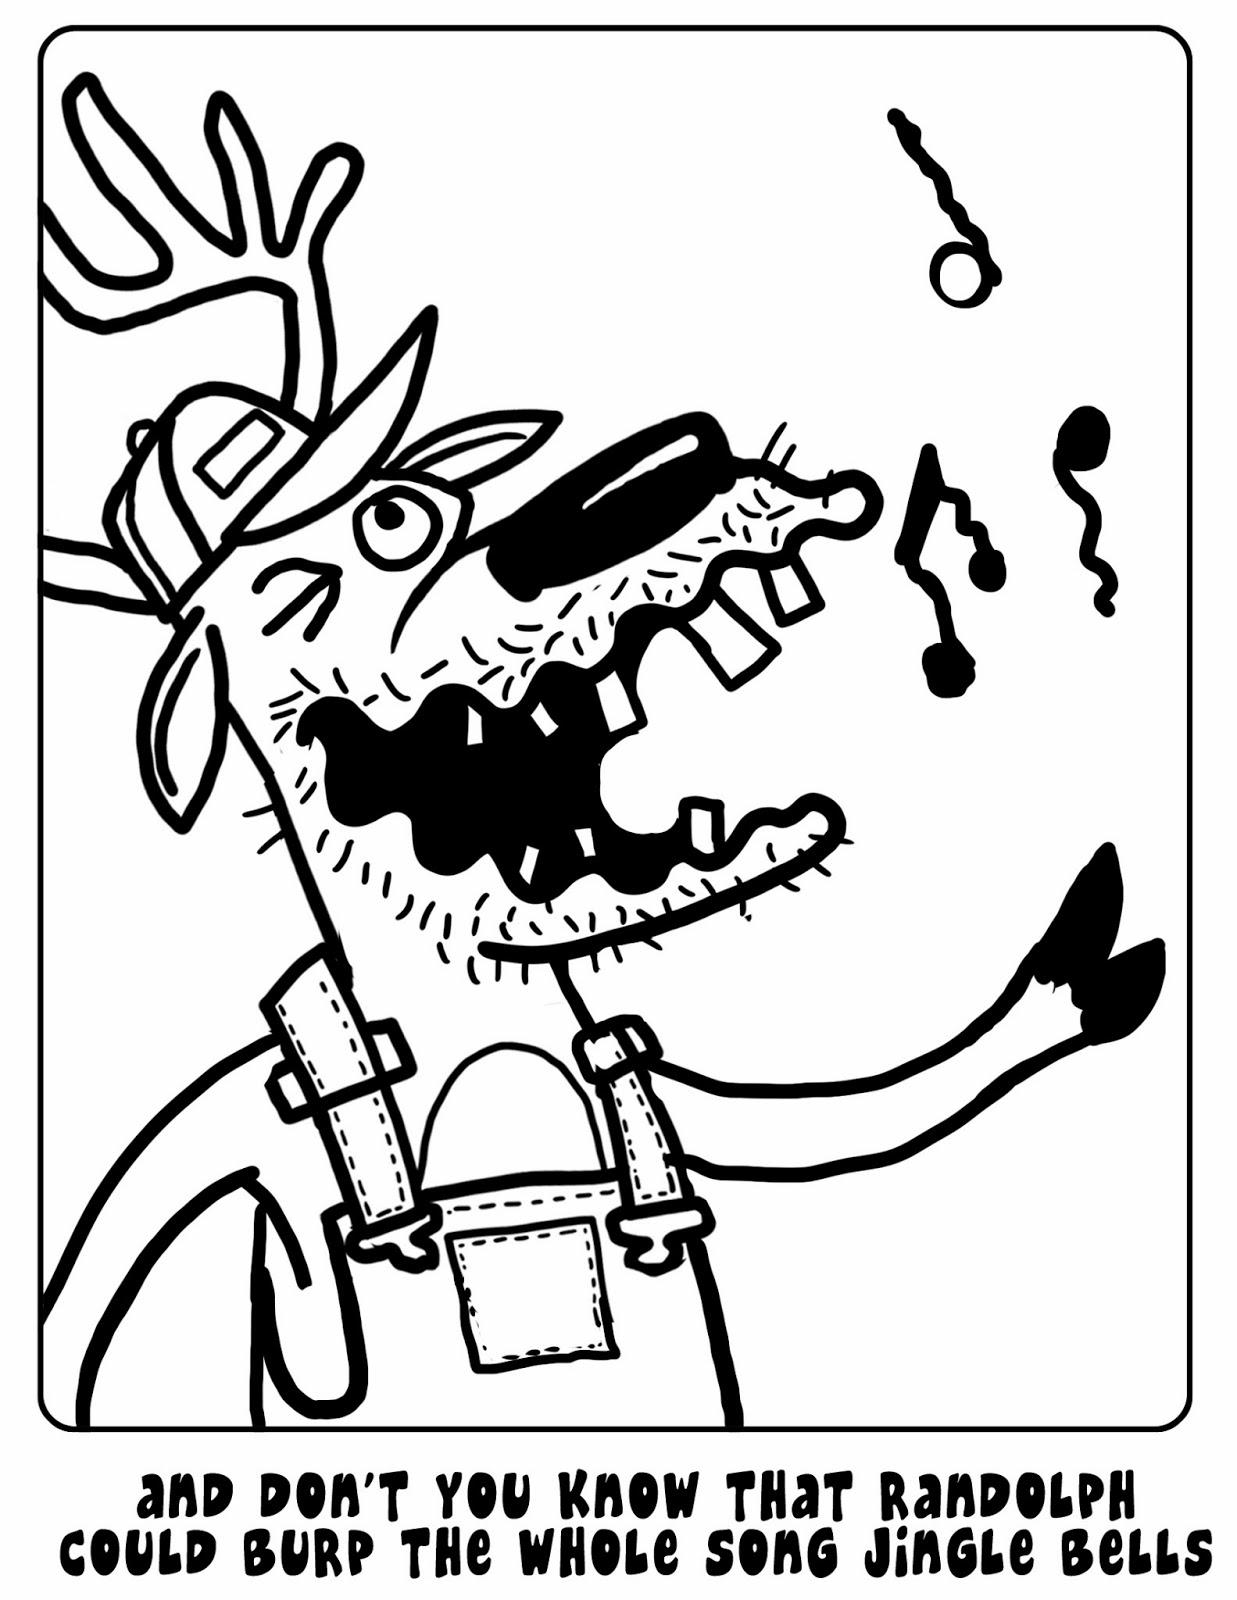 I Drew a Horse Once: Randolph the Redneck Reindeer